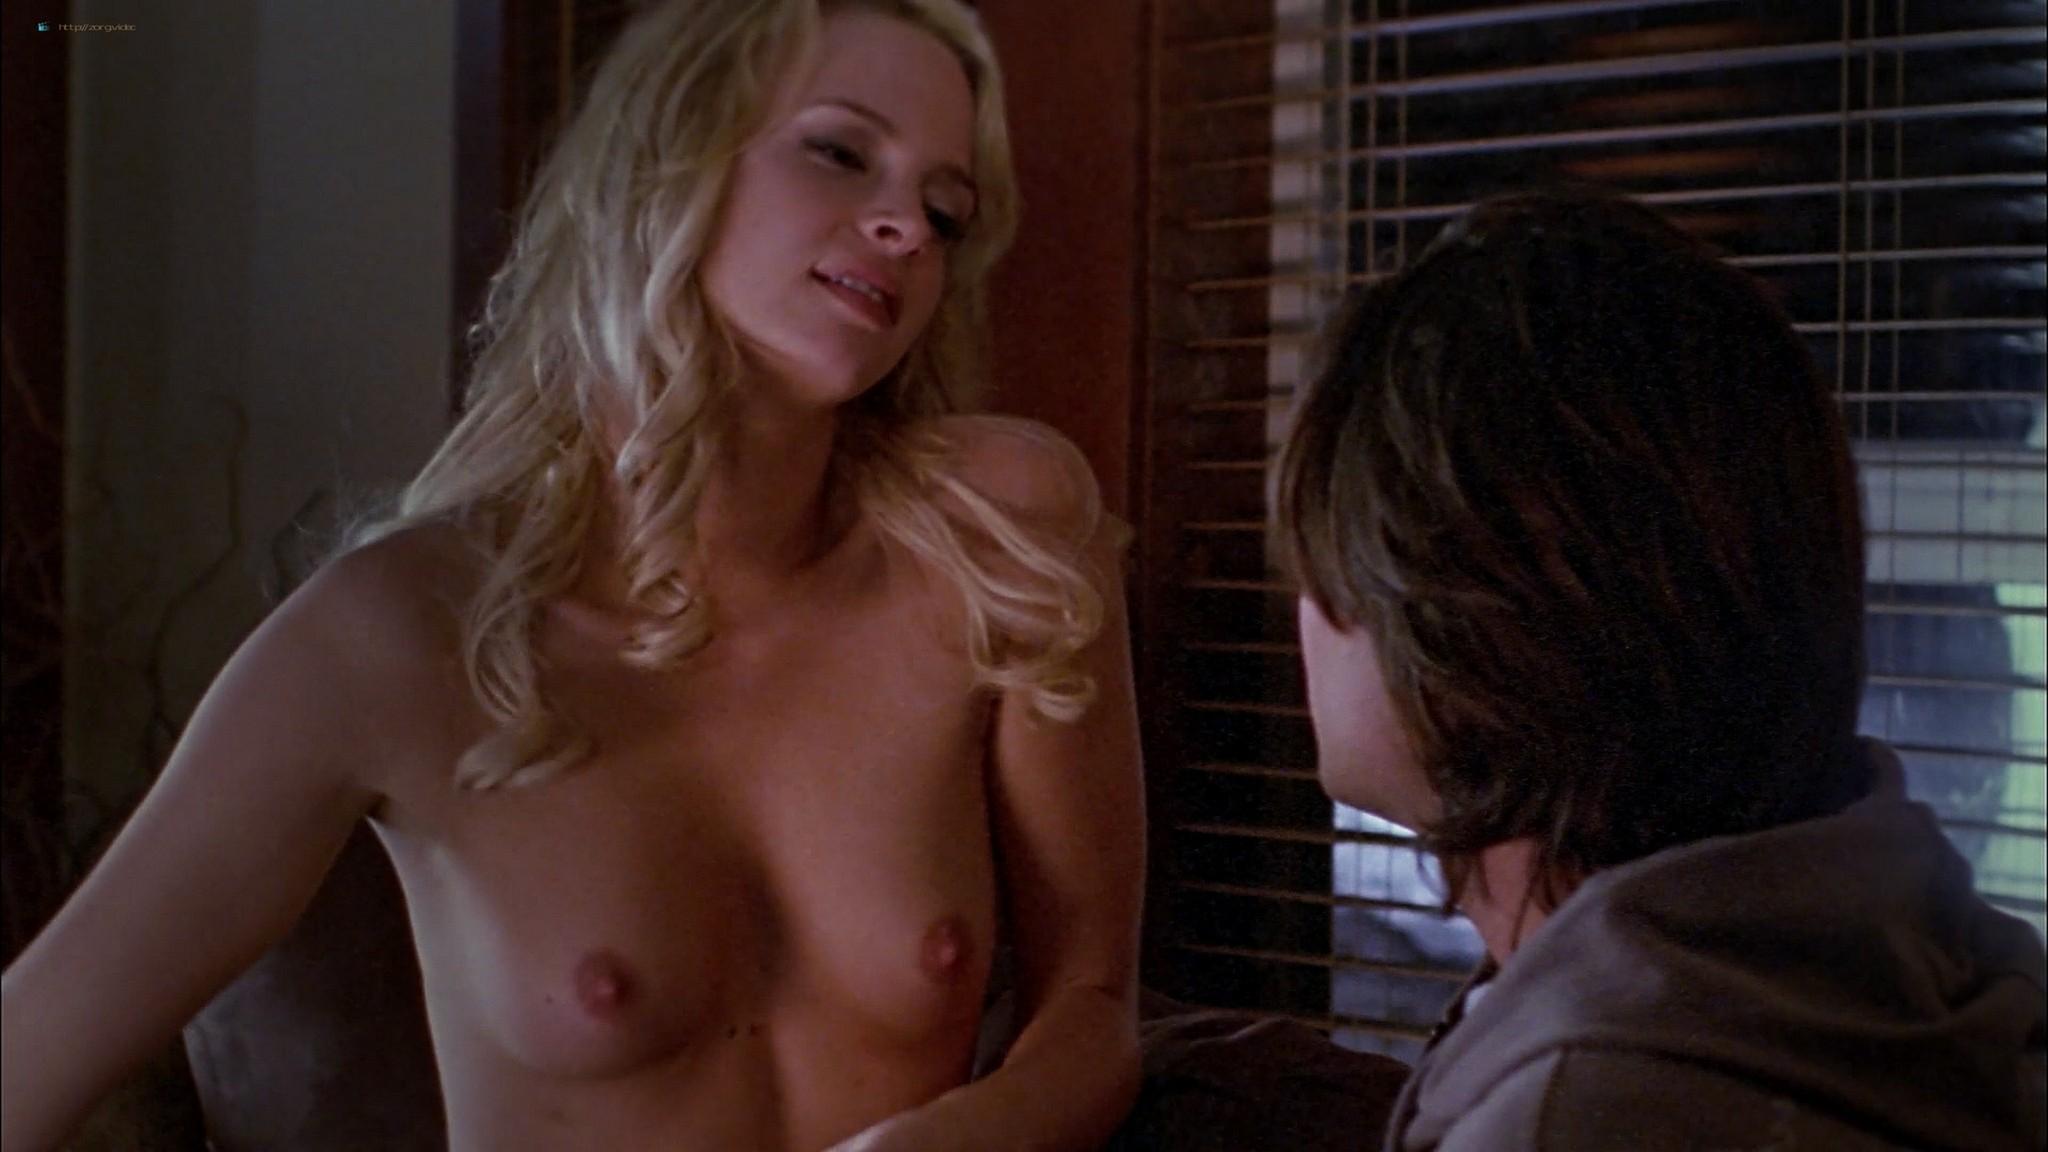 Lindsay Maxwell nude Amber Borycki sexy - Revenge of the Boarding School Dropouts (2009) HD 1080p Web (10)